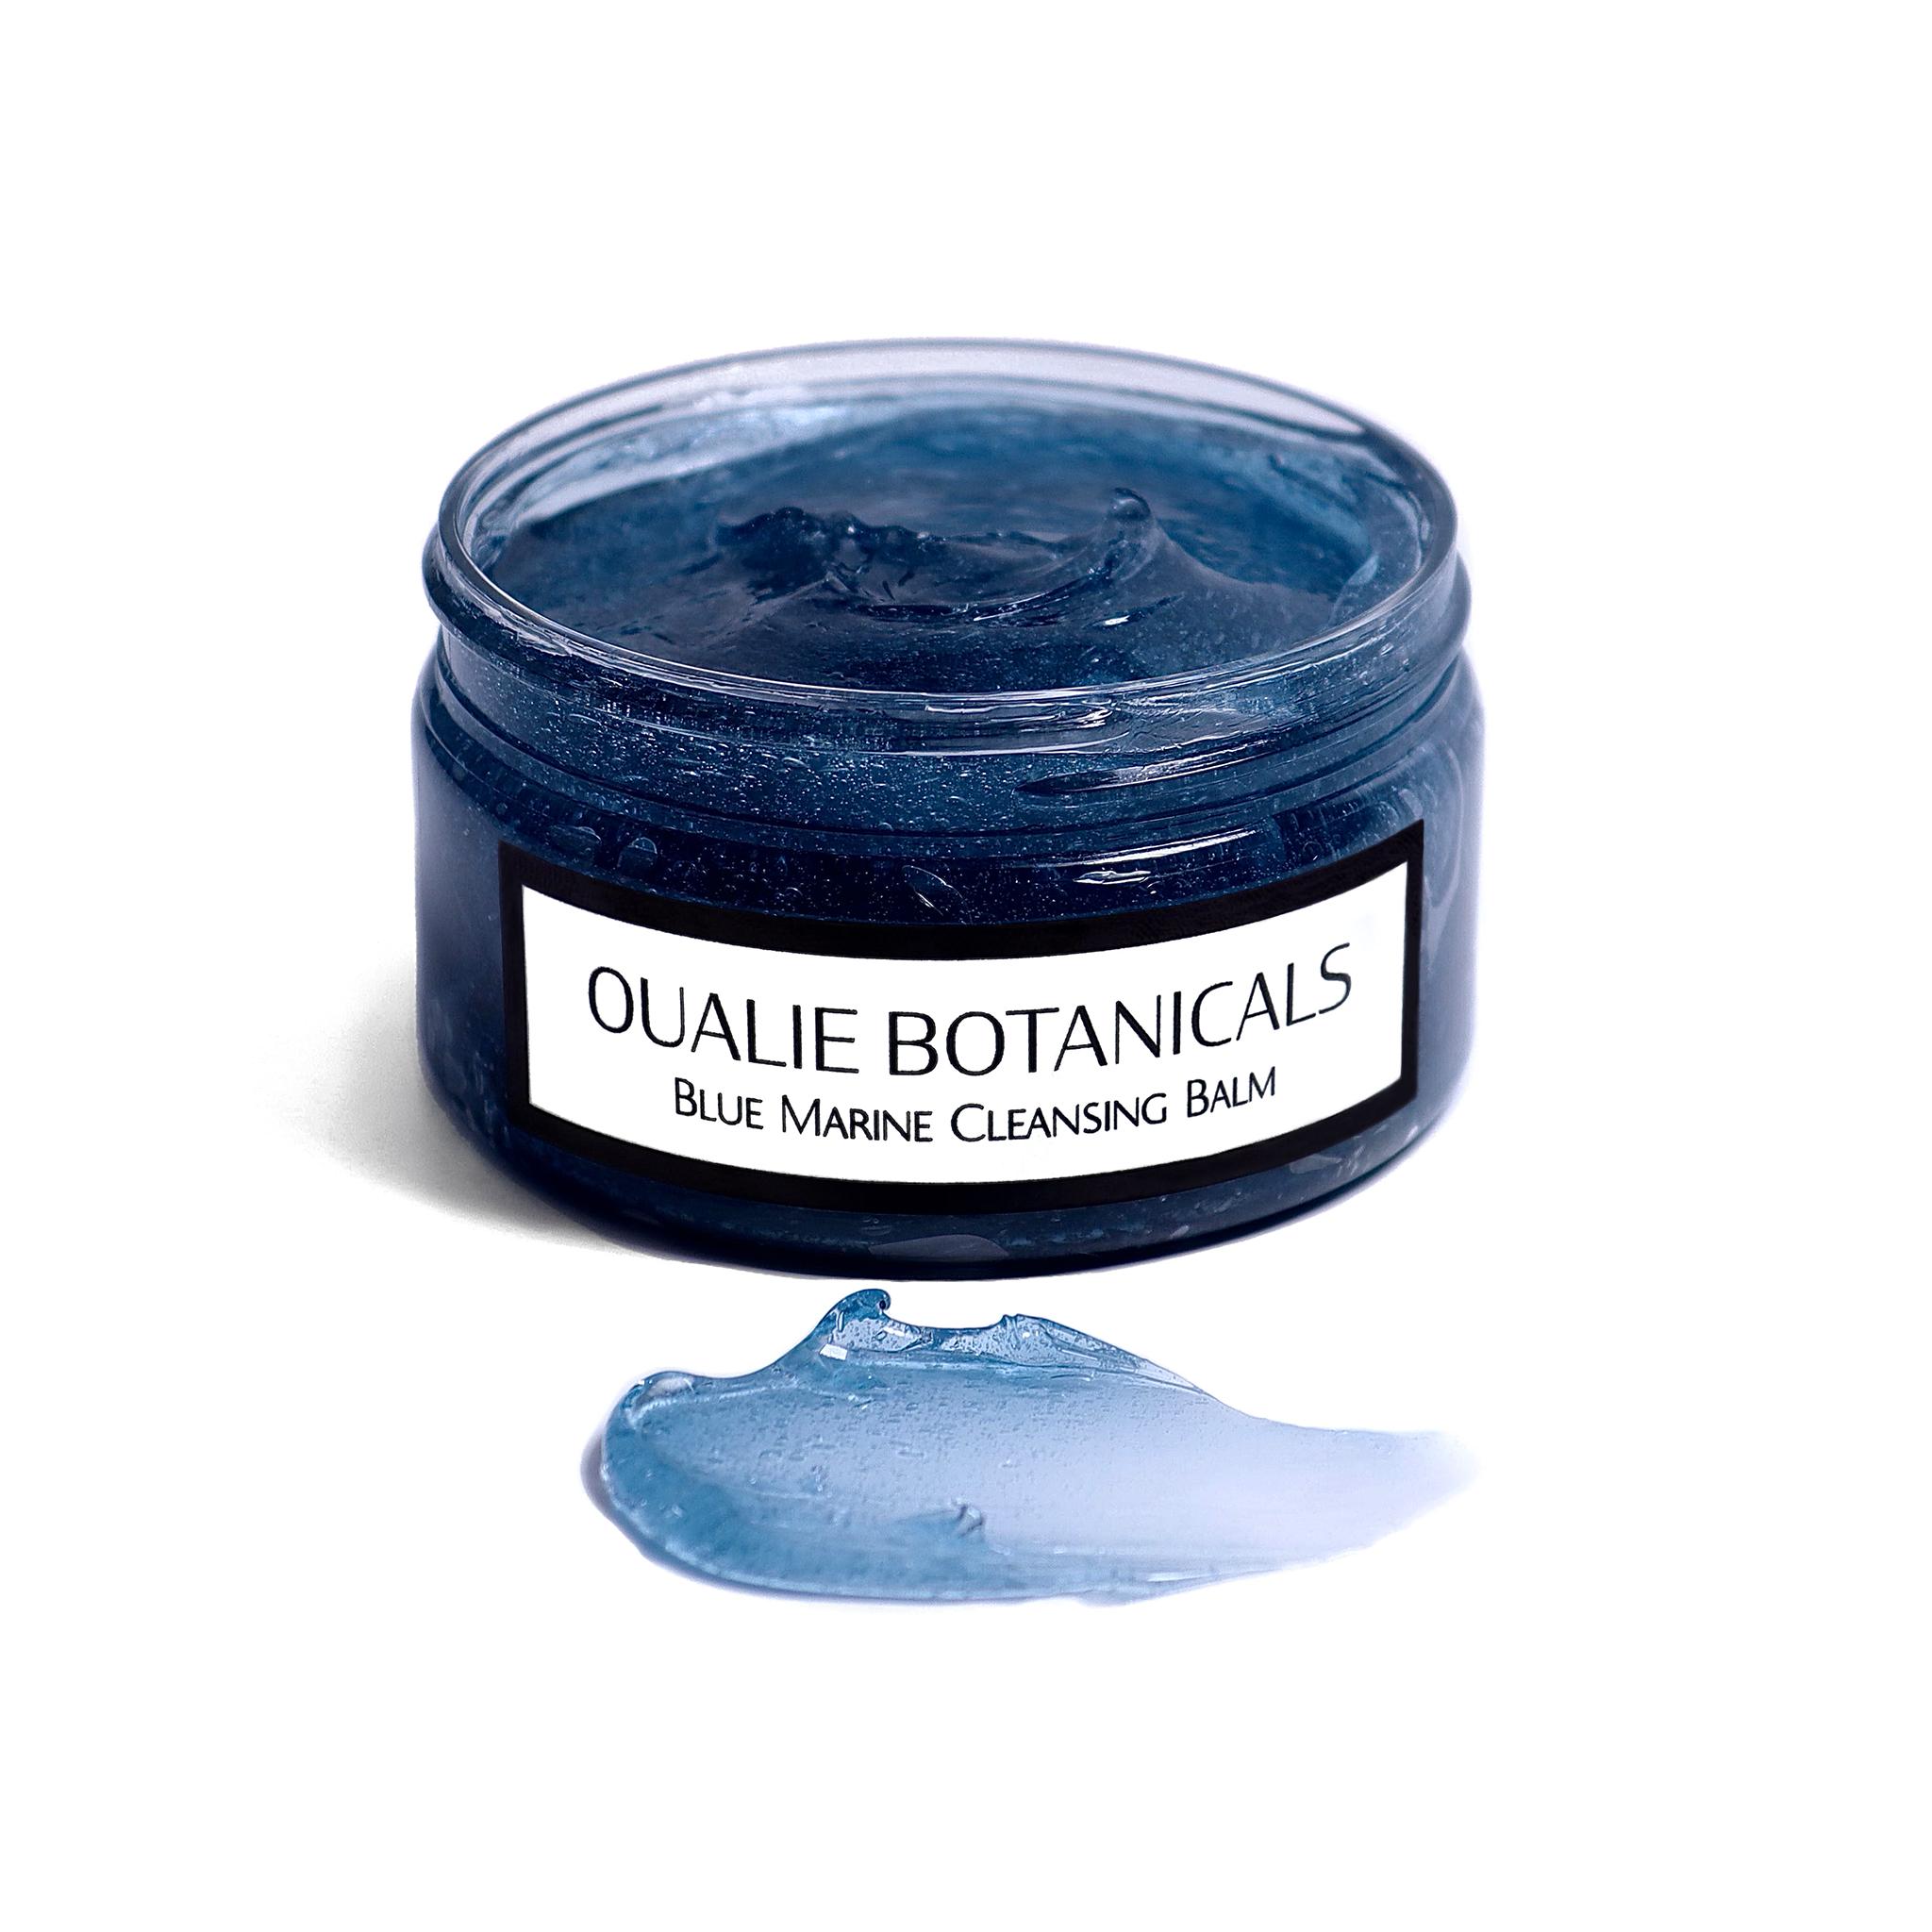 oualie-botanicals-blue-marine-cleansing-balm